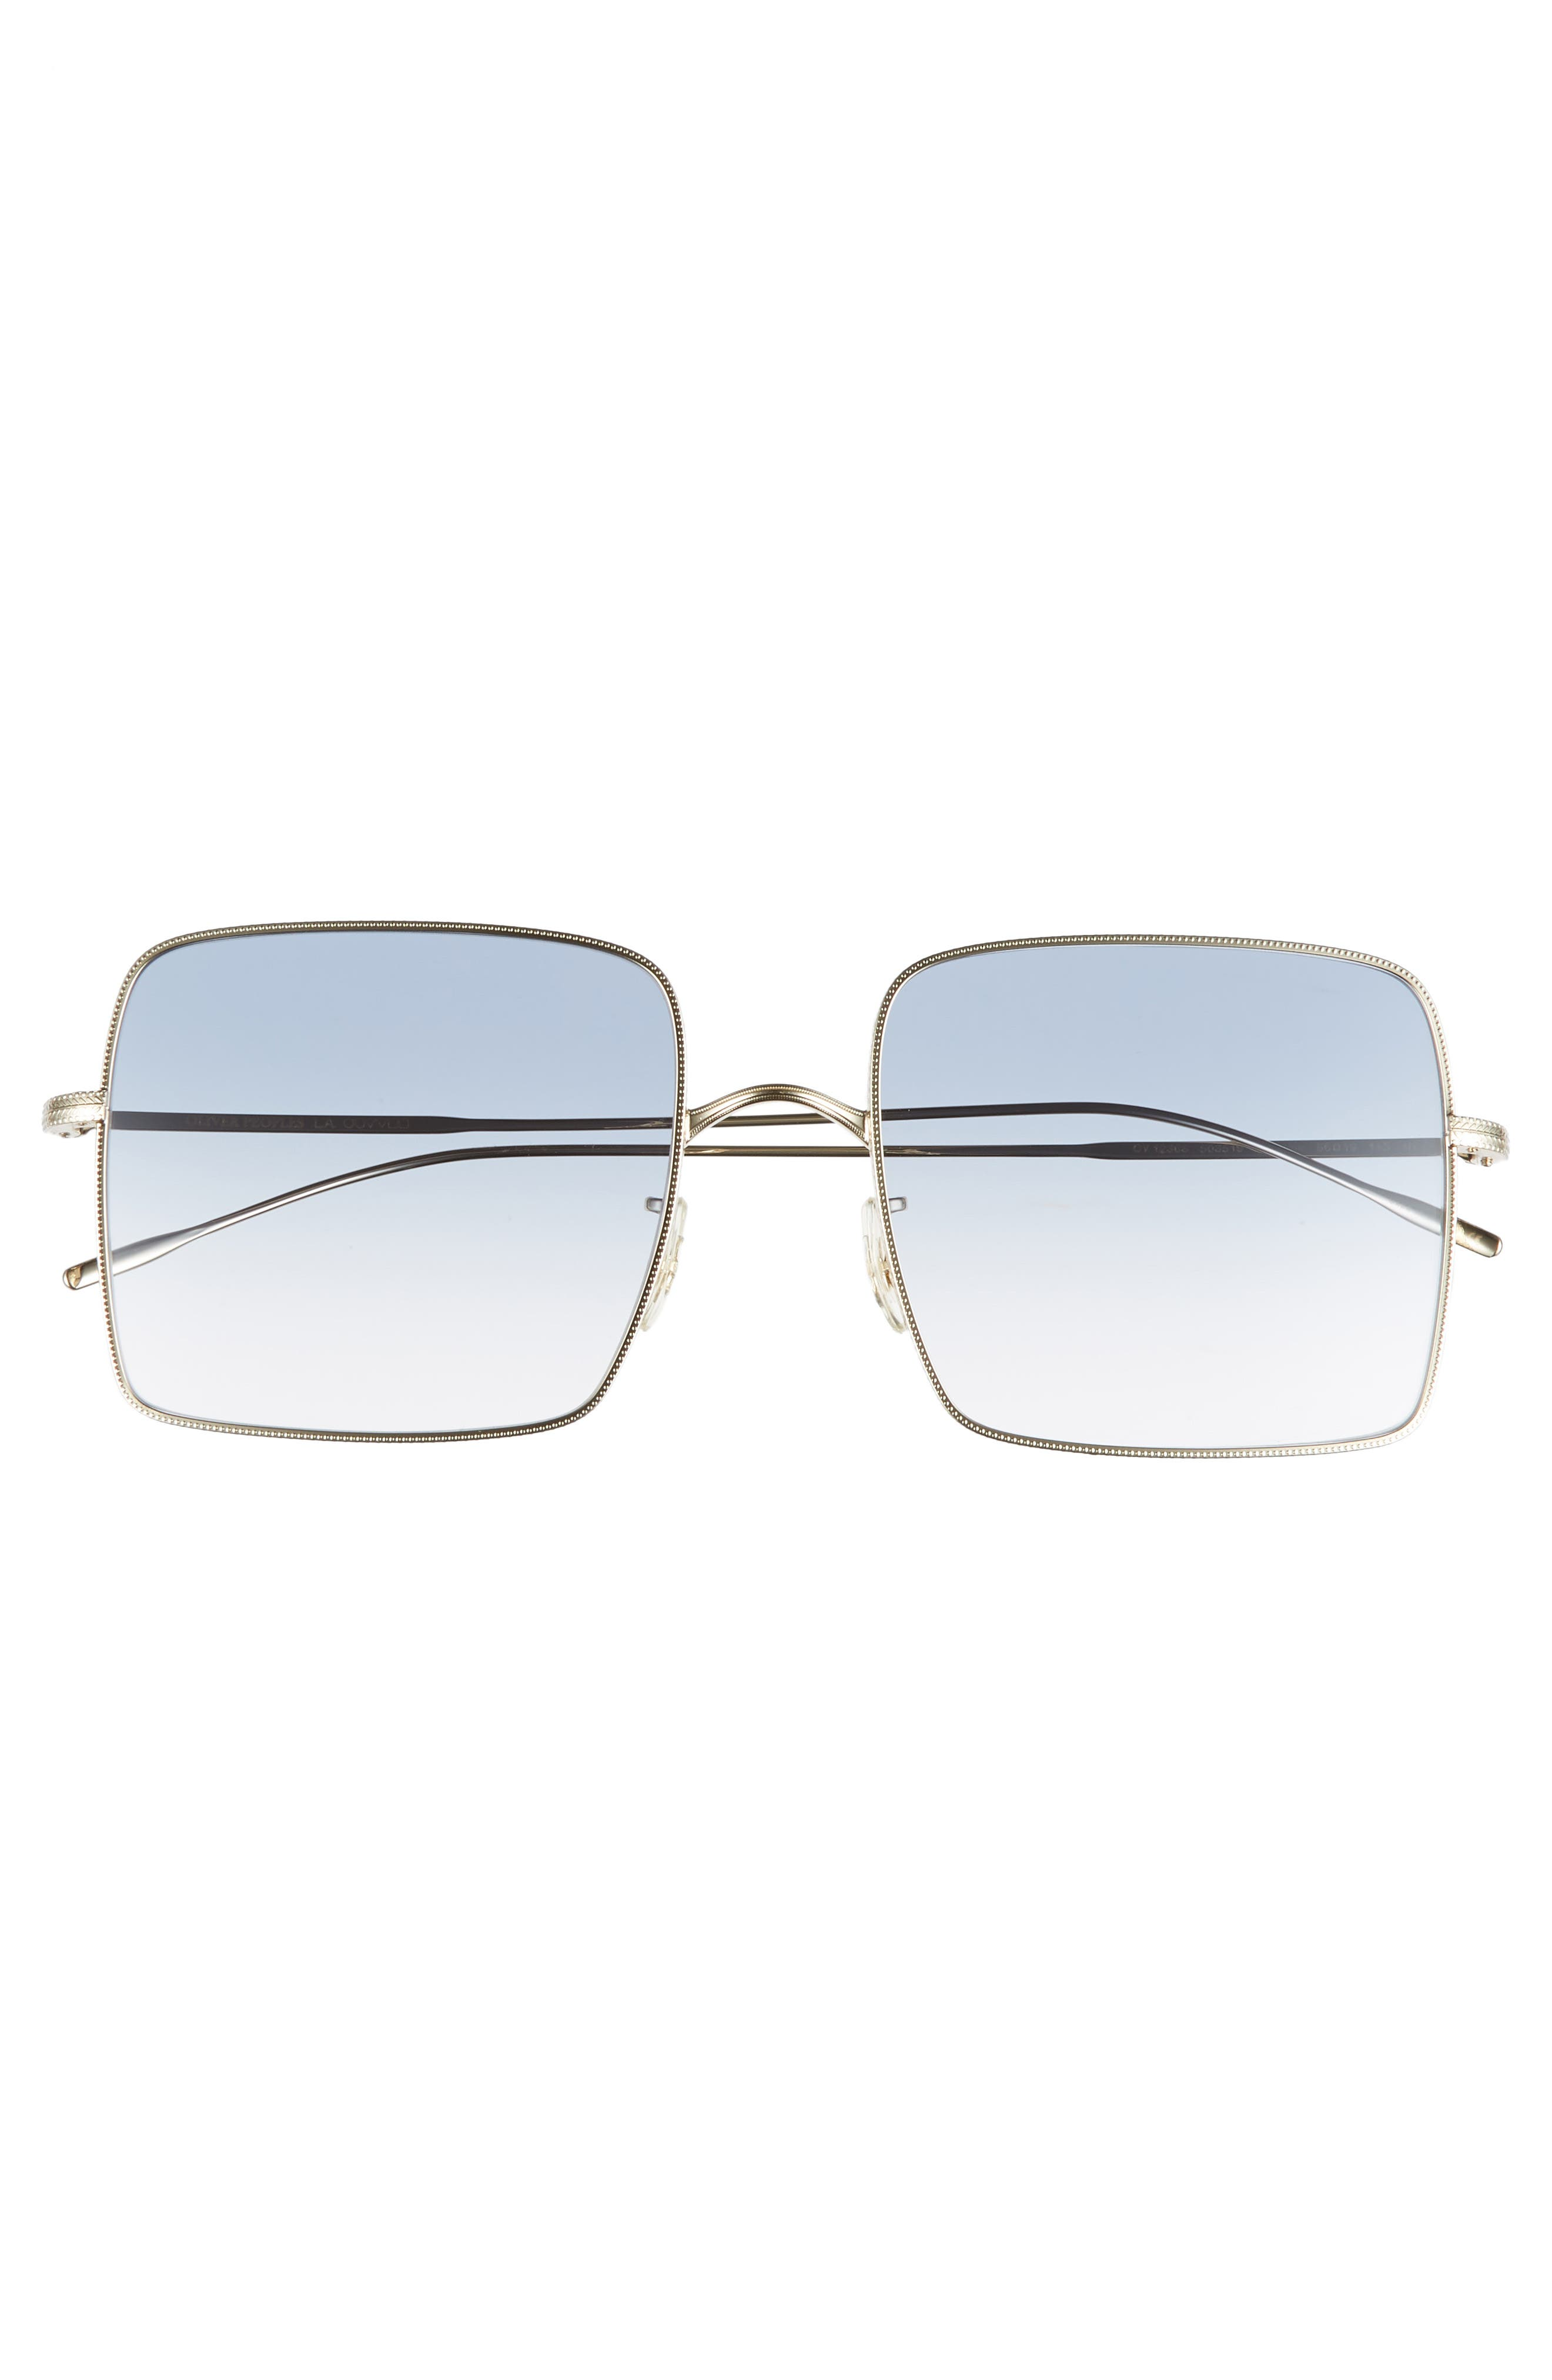 Rassine 56mm Sunglasses,                             Alternate thumbnail 3, color,                             Soft Gold Blue